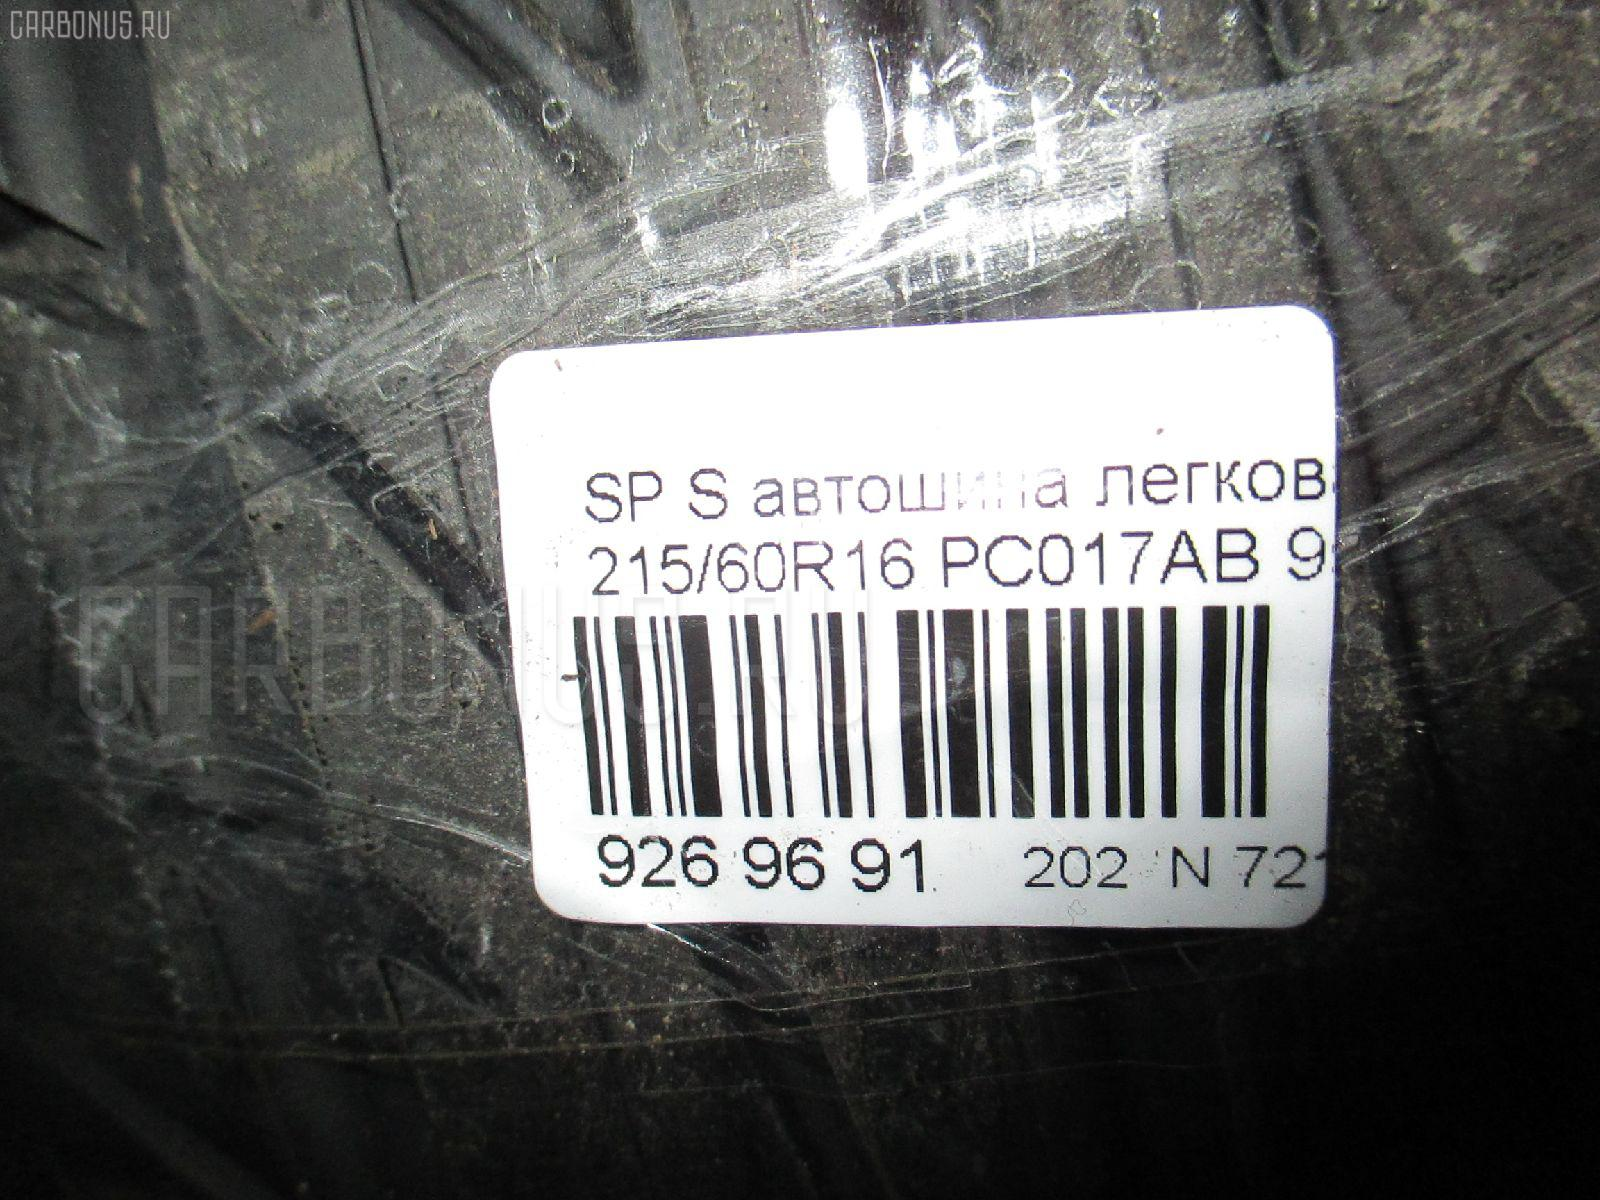 Автошина легковая летняя SP SPORT LM703 215/60R16 DUNLOP PC017AB Фото 4